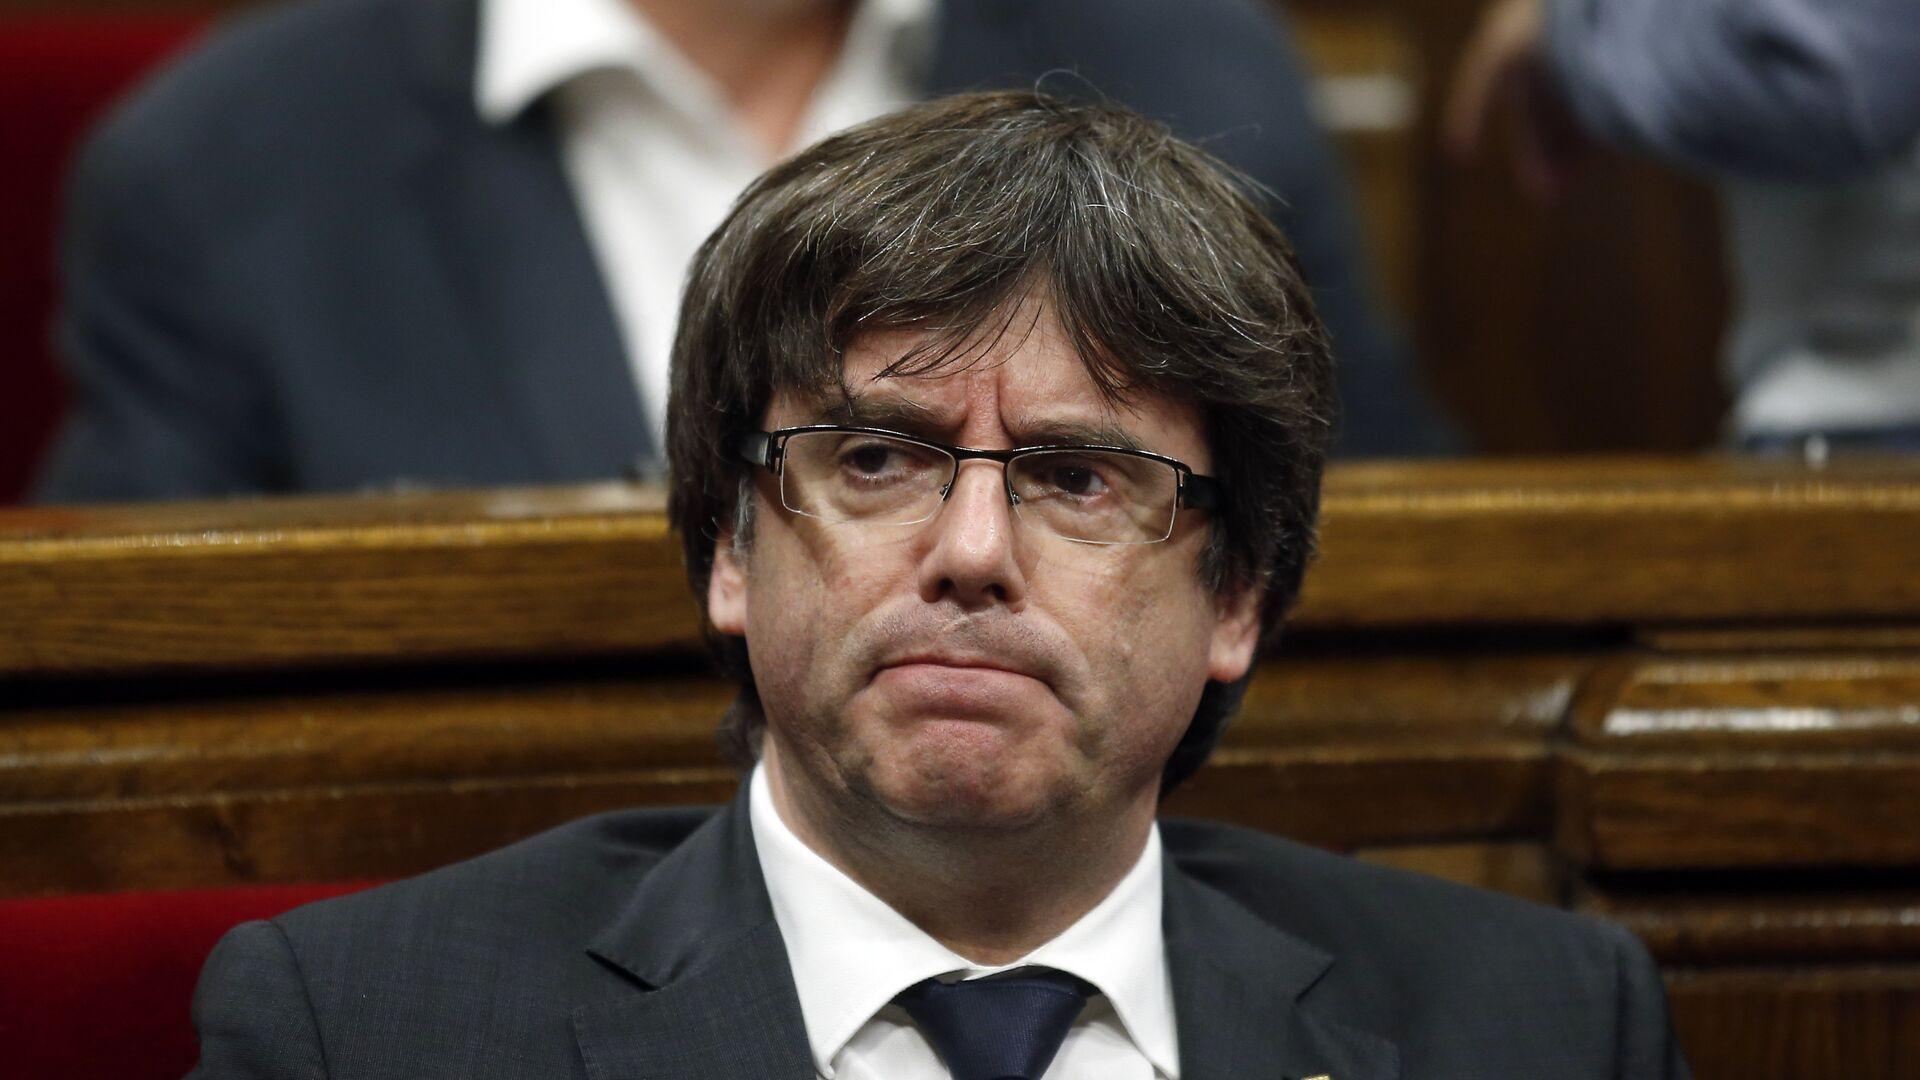 Carles Puigdemont, presidente del Gobierno catalán - Sputnik Mundo, 1920, 25.02.2021